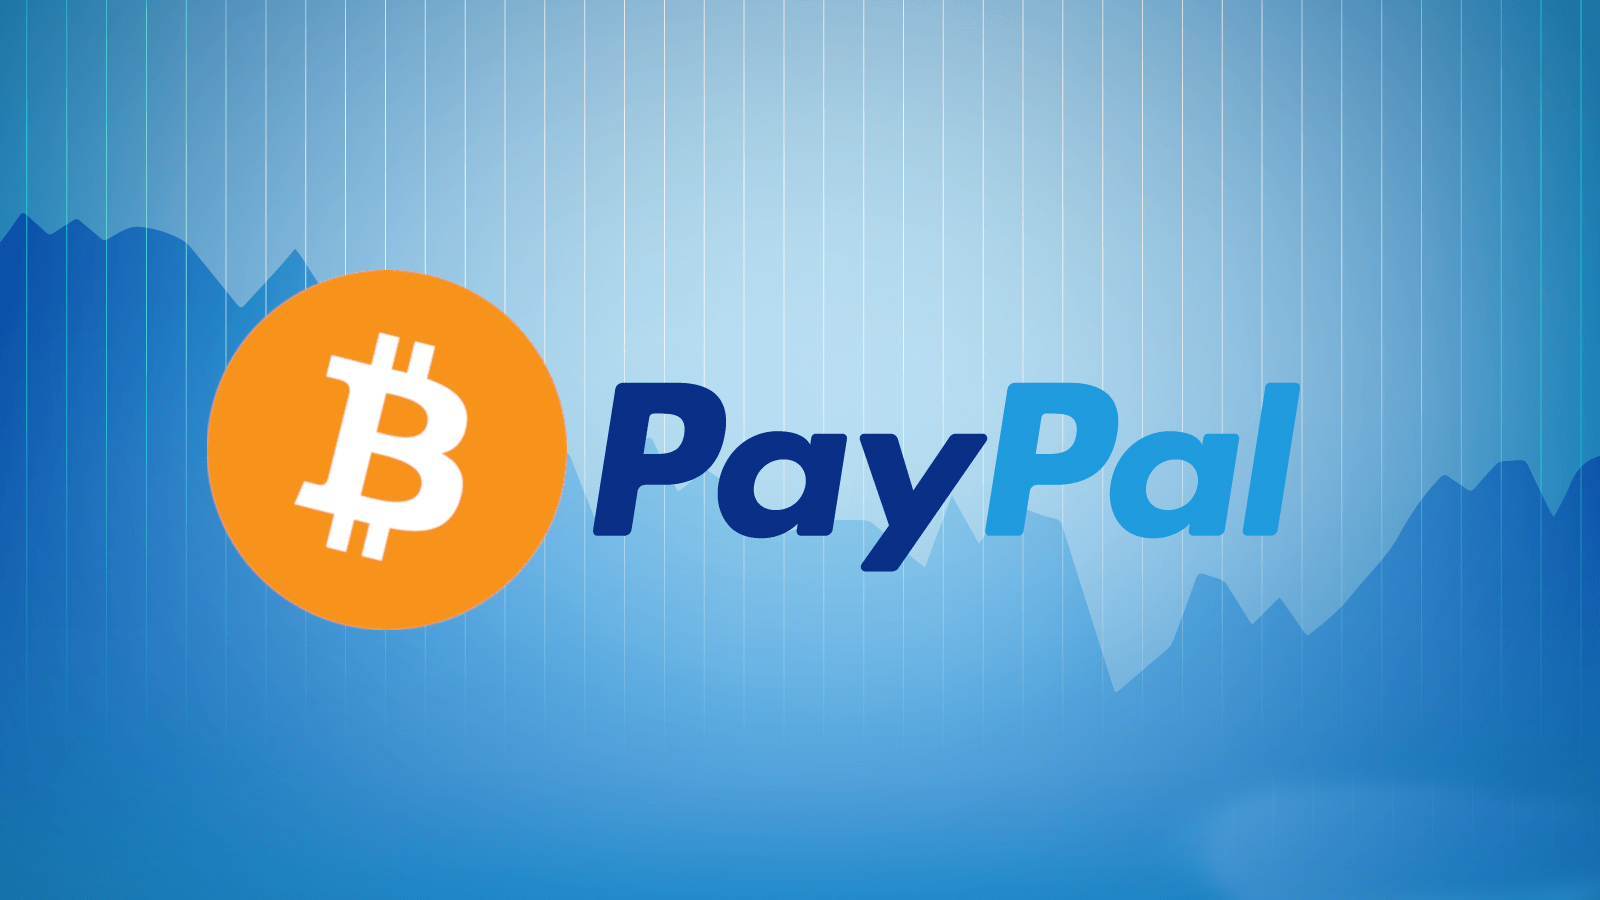 paypal bitcoine kapilarini aciyor paypal btc